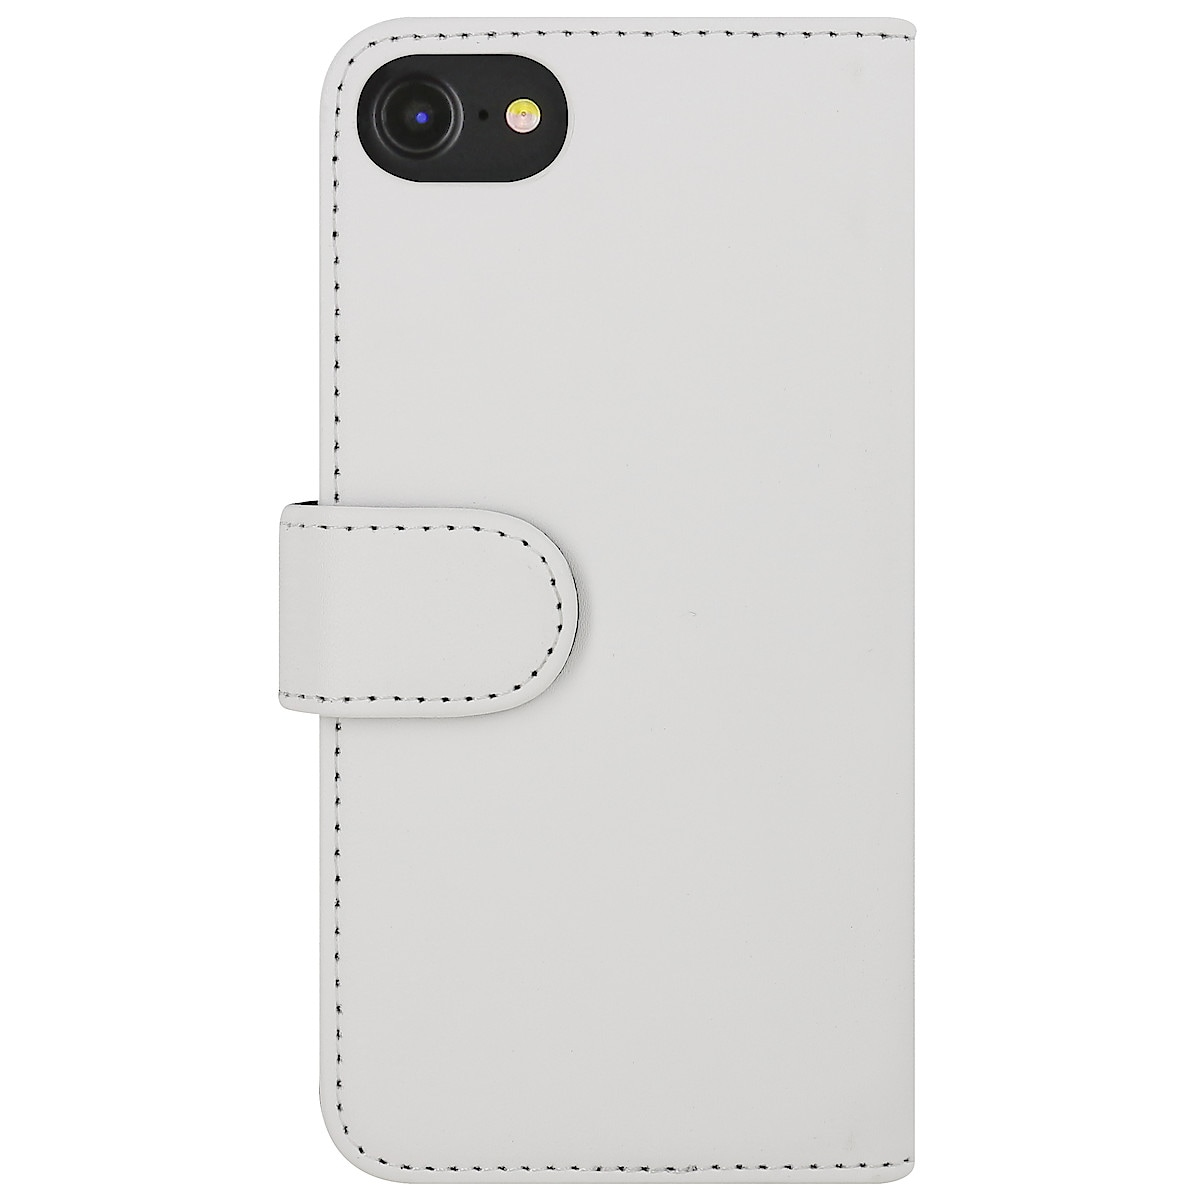 Plånboksfodral för iPhone 6/6s/7/8, Holdit